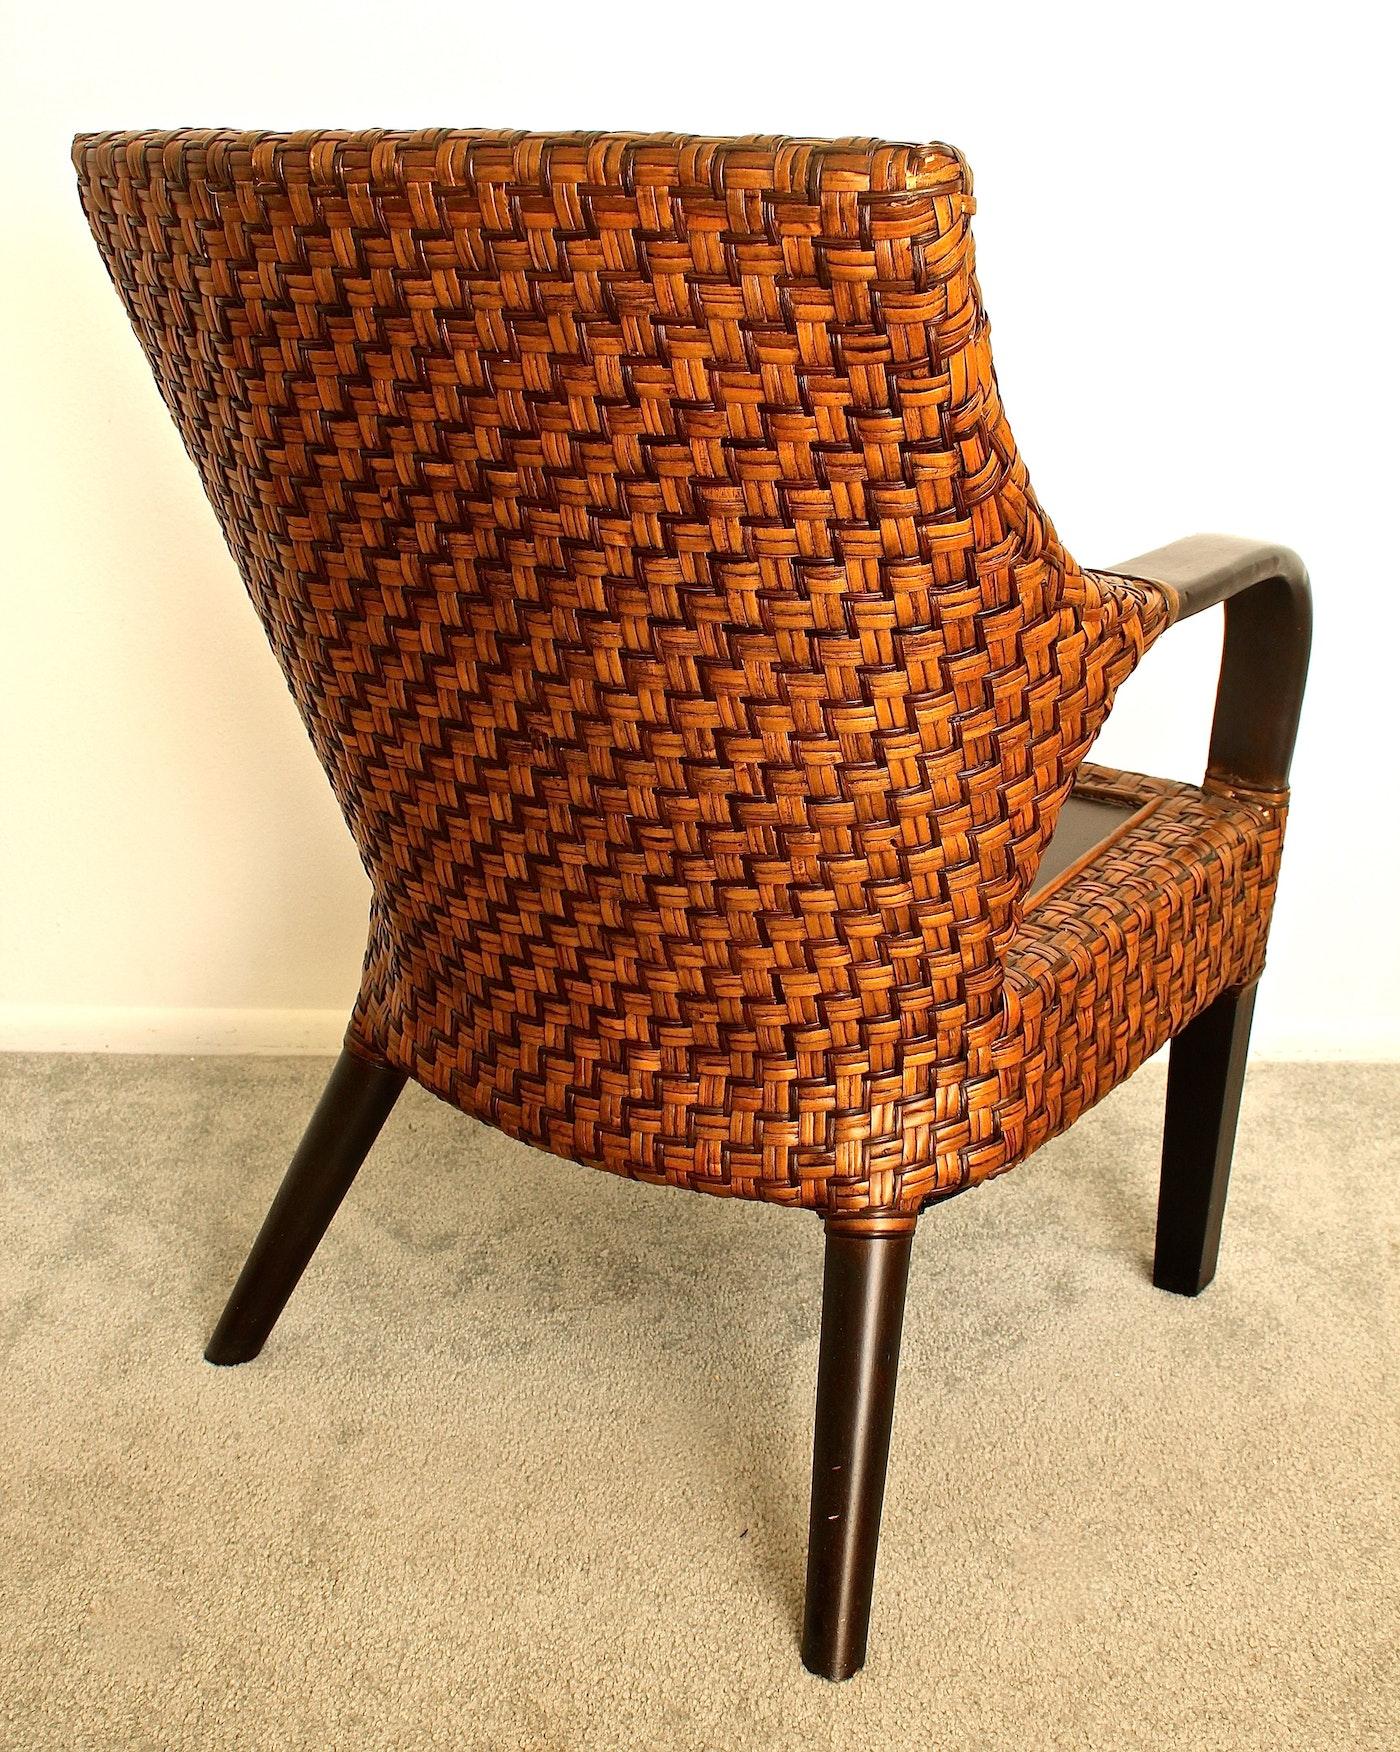 Pier 1 Imports Rattan Chair : EBTH